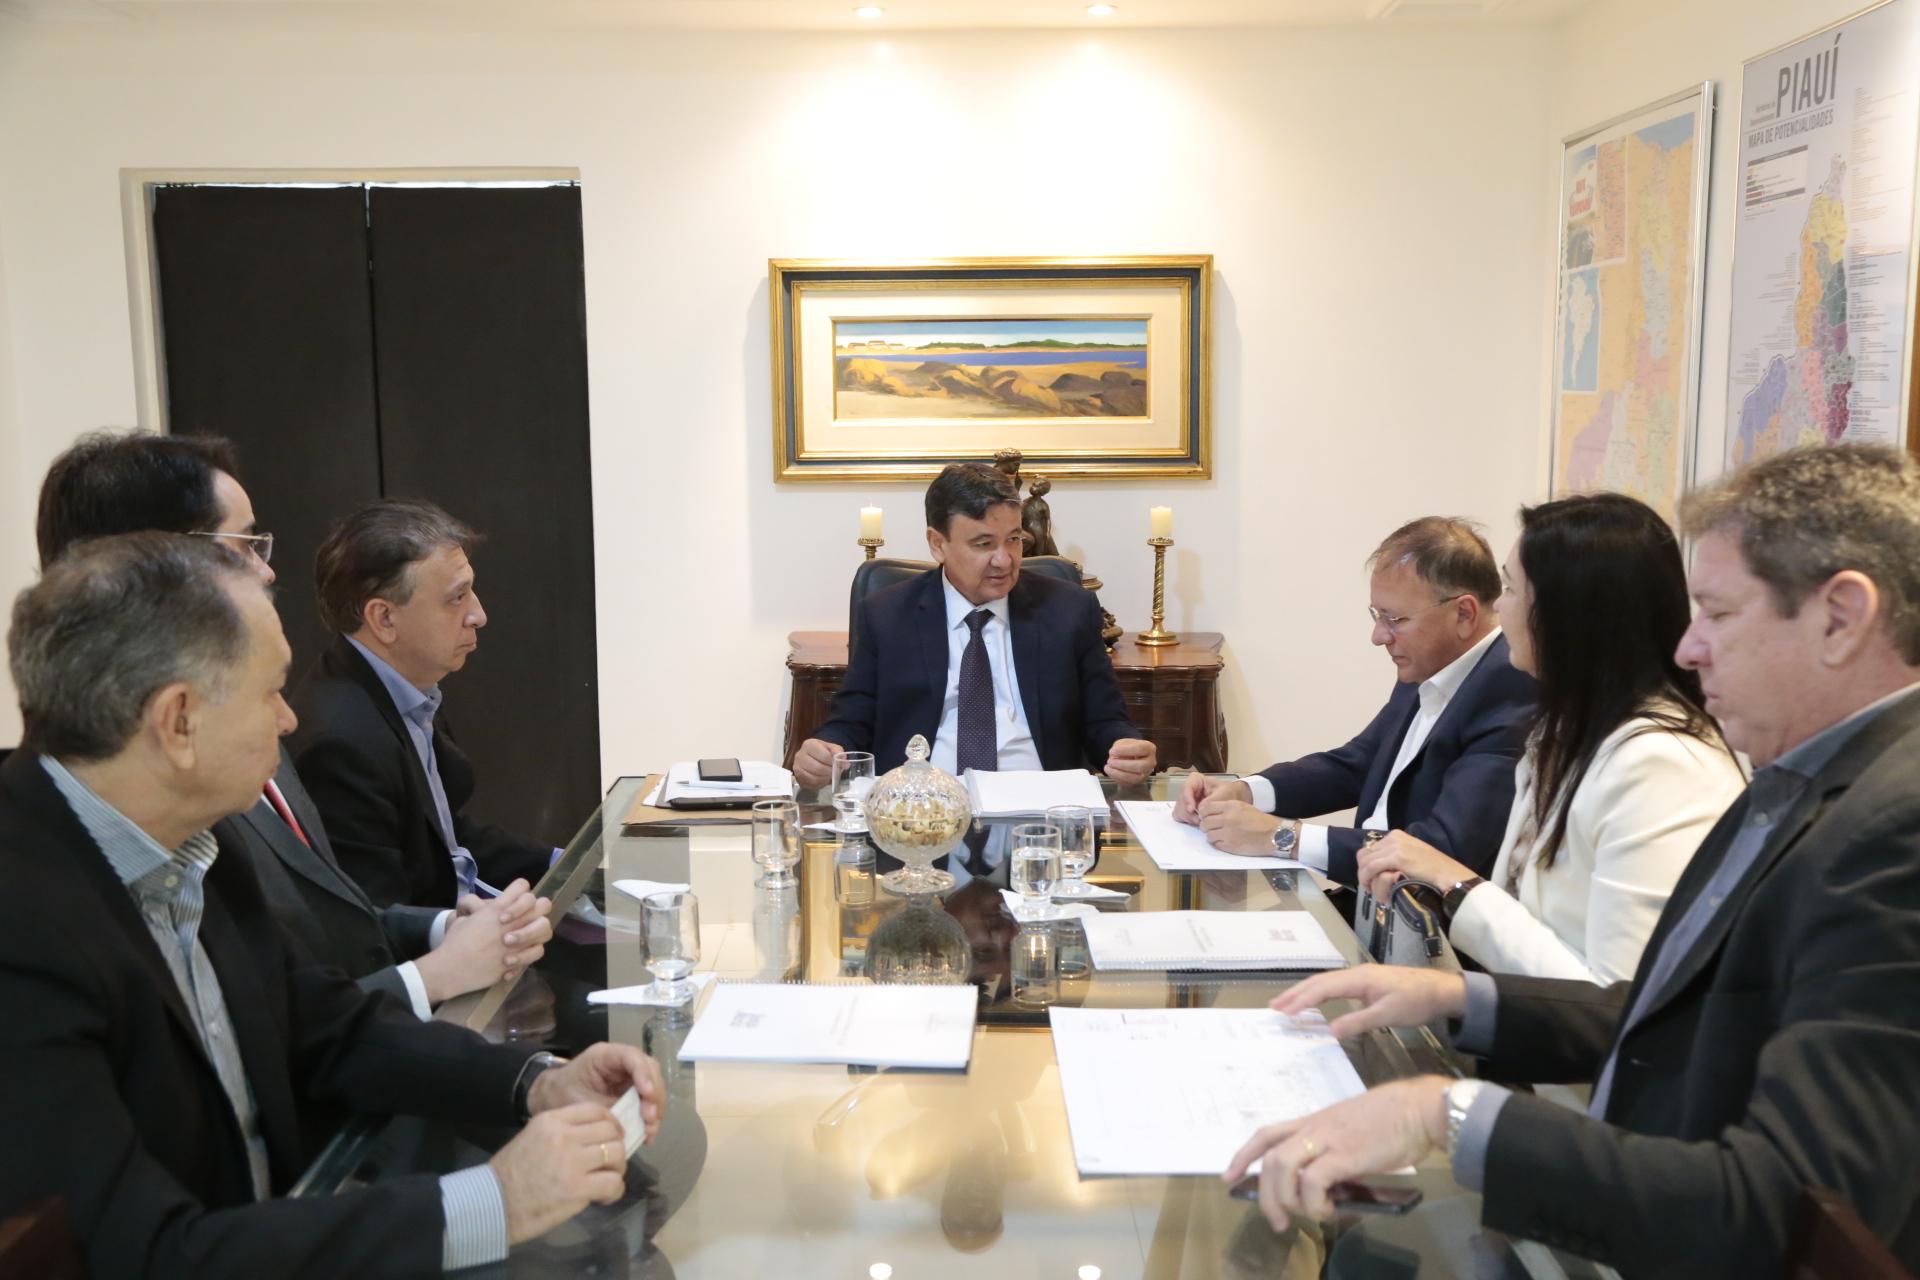 Governador recebe representantes de indústria de trigo que implantará base no Piauí